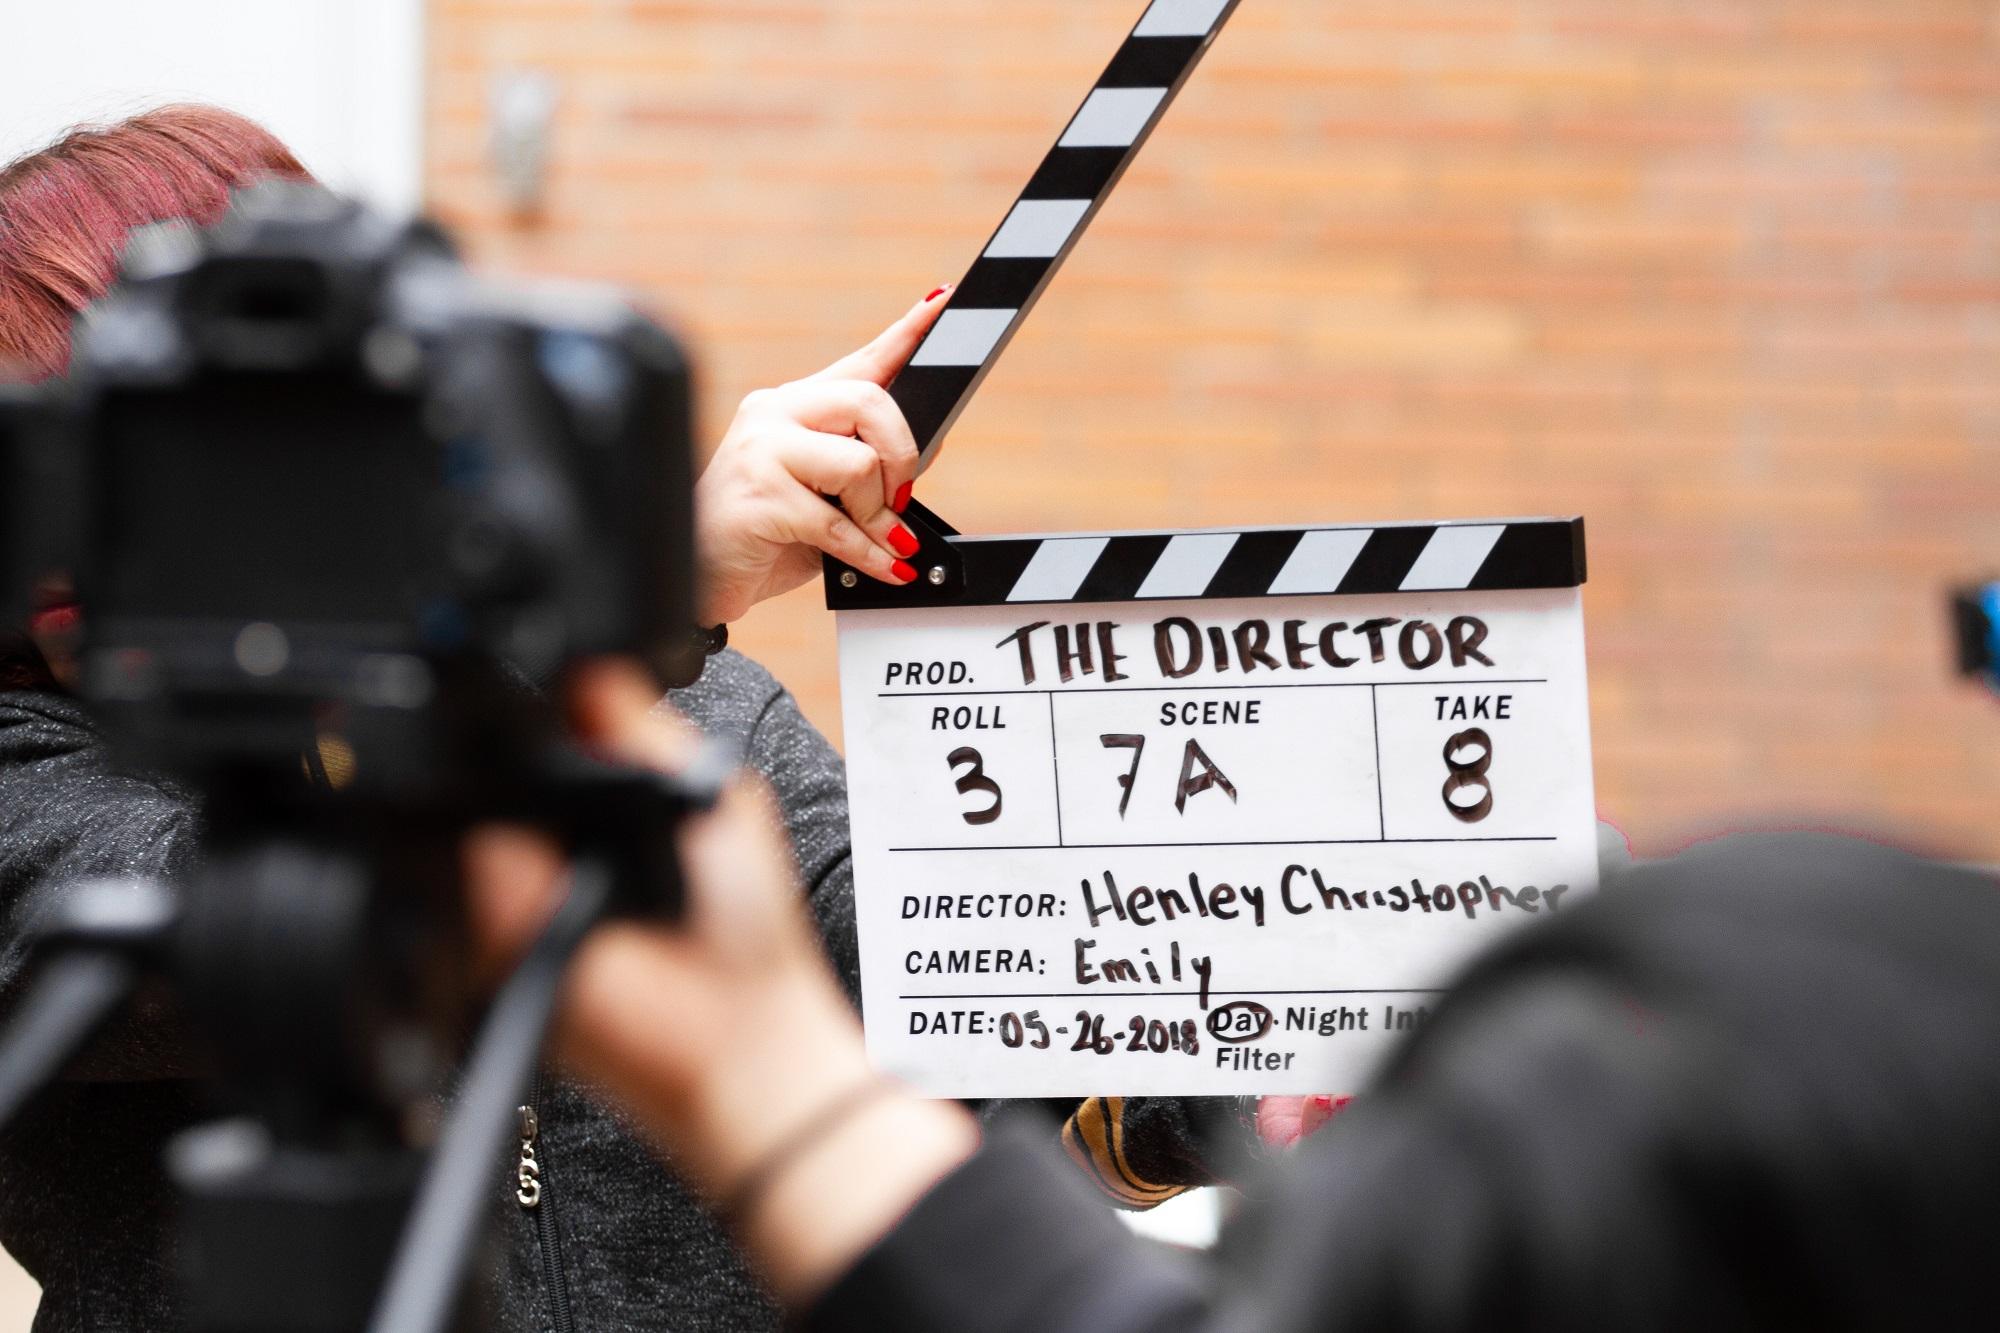 Uskoro počinje Festival novog filma i videa